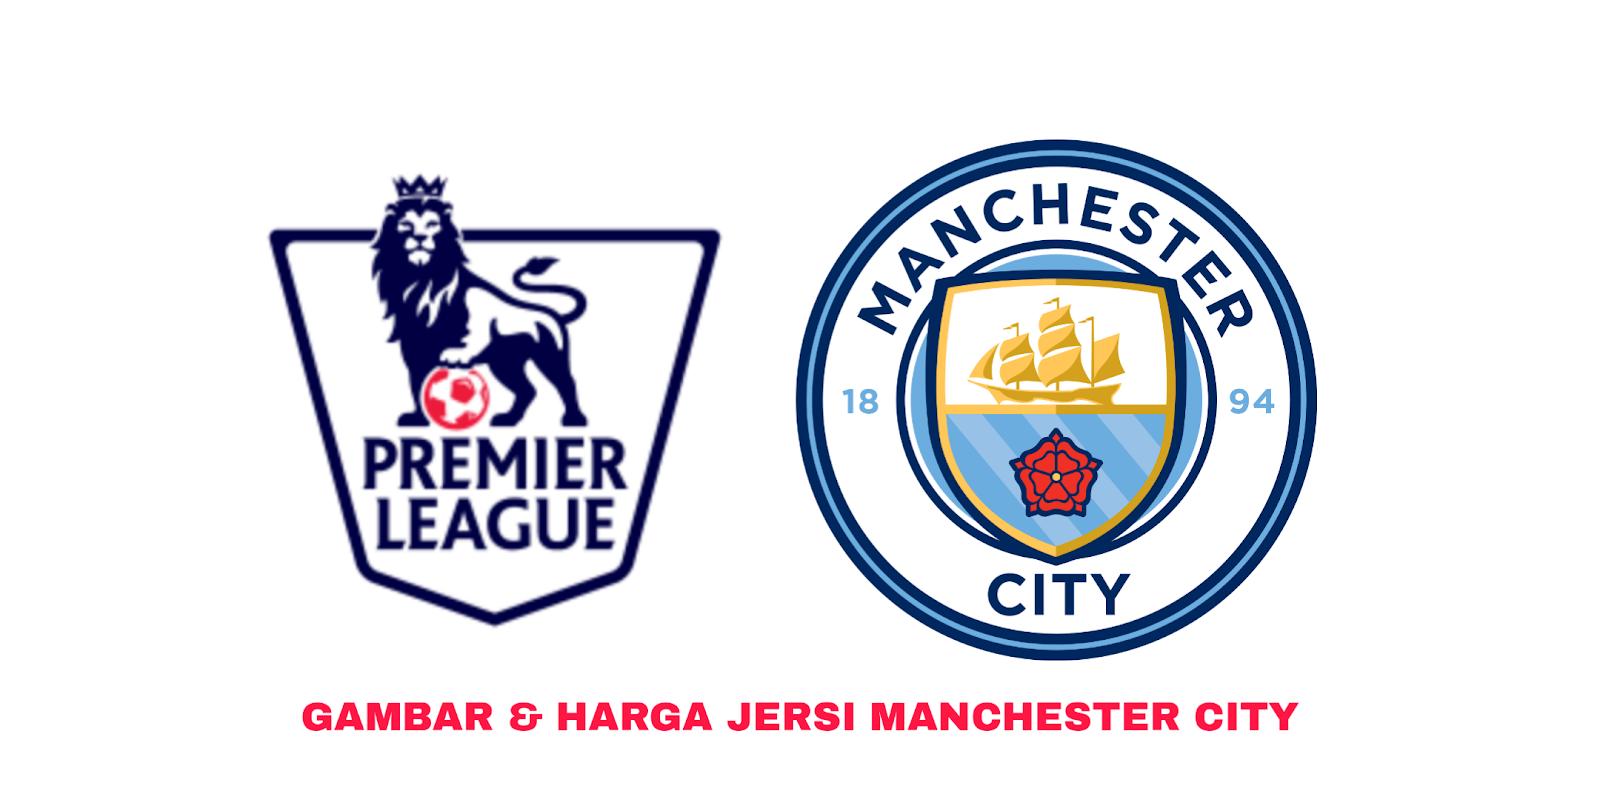 Gambar Dan Harga Jersi Baru Manchester City 2019 2020 MY